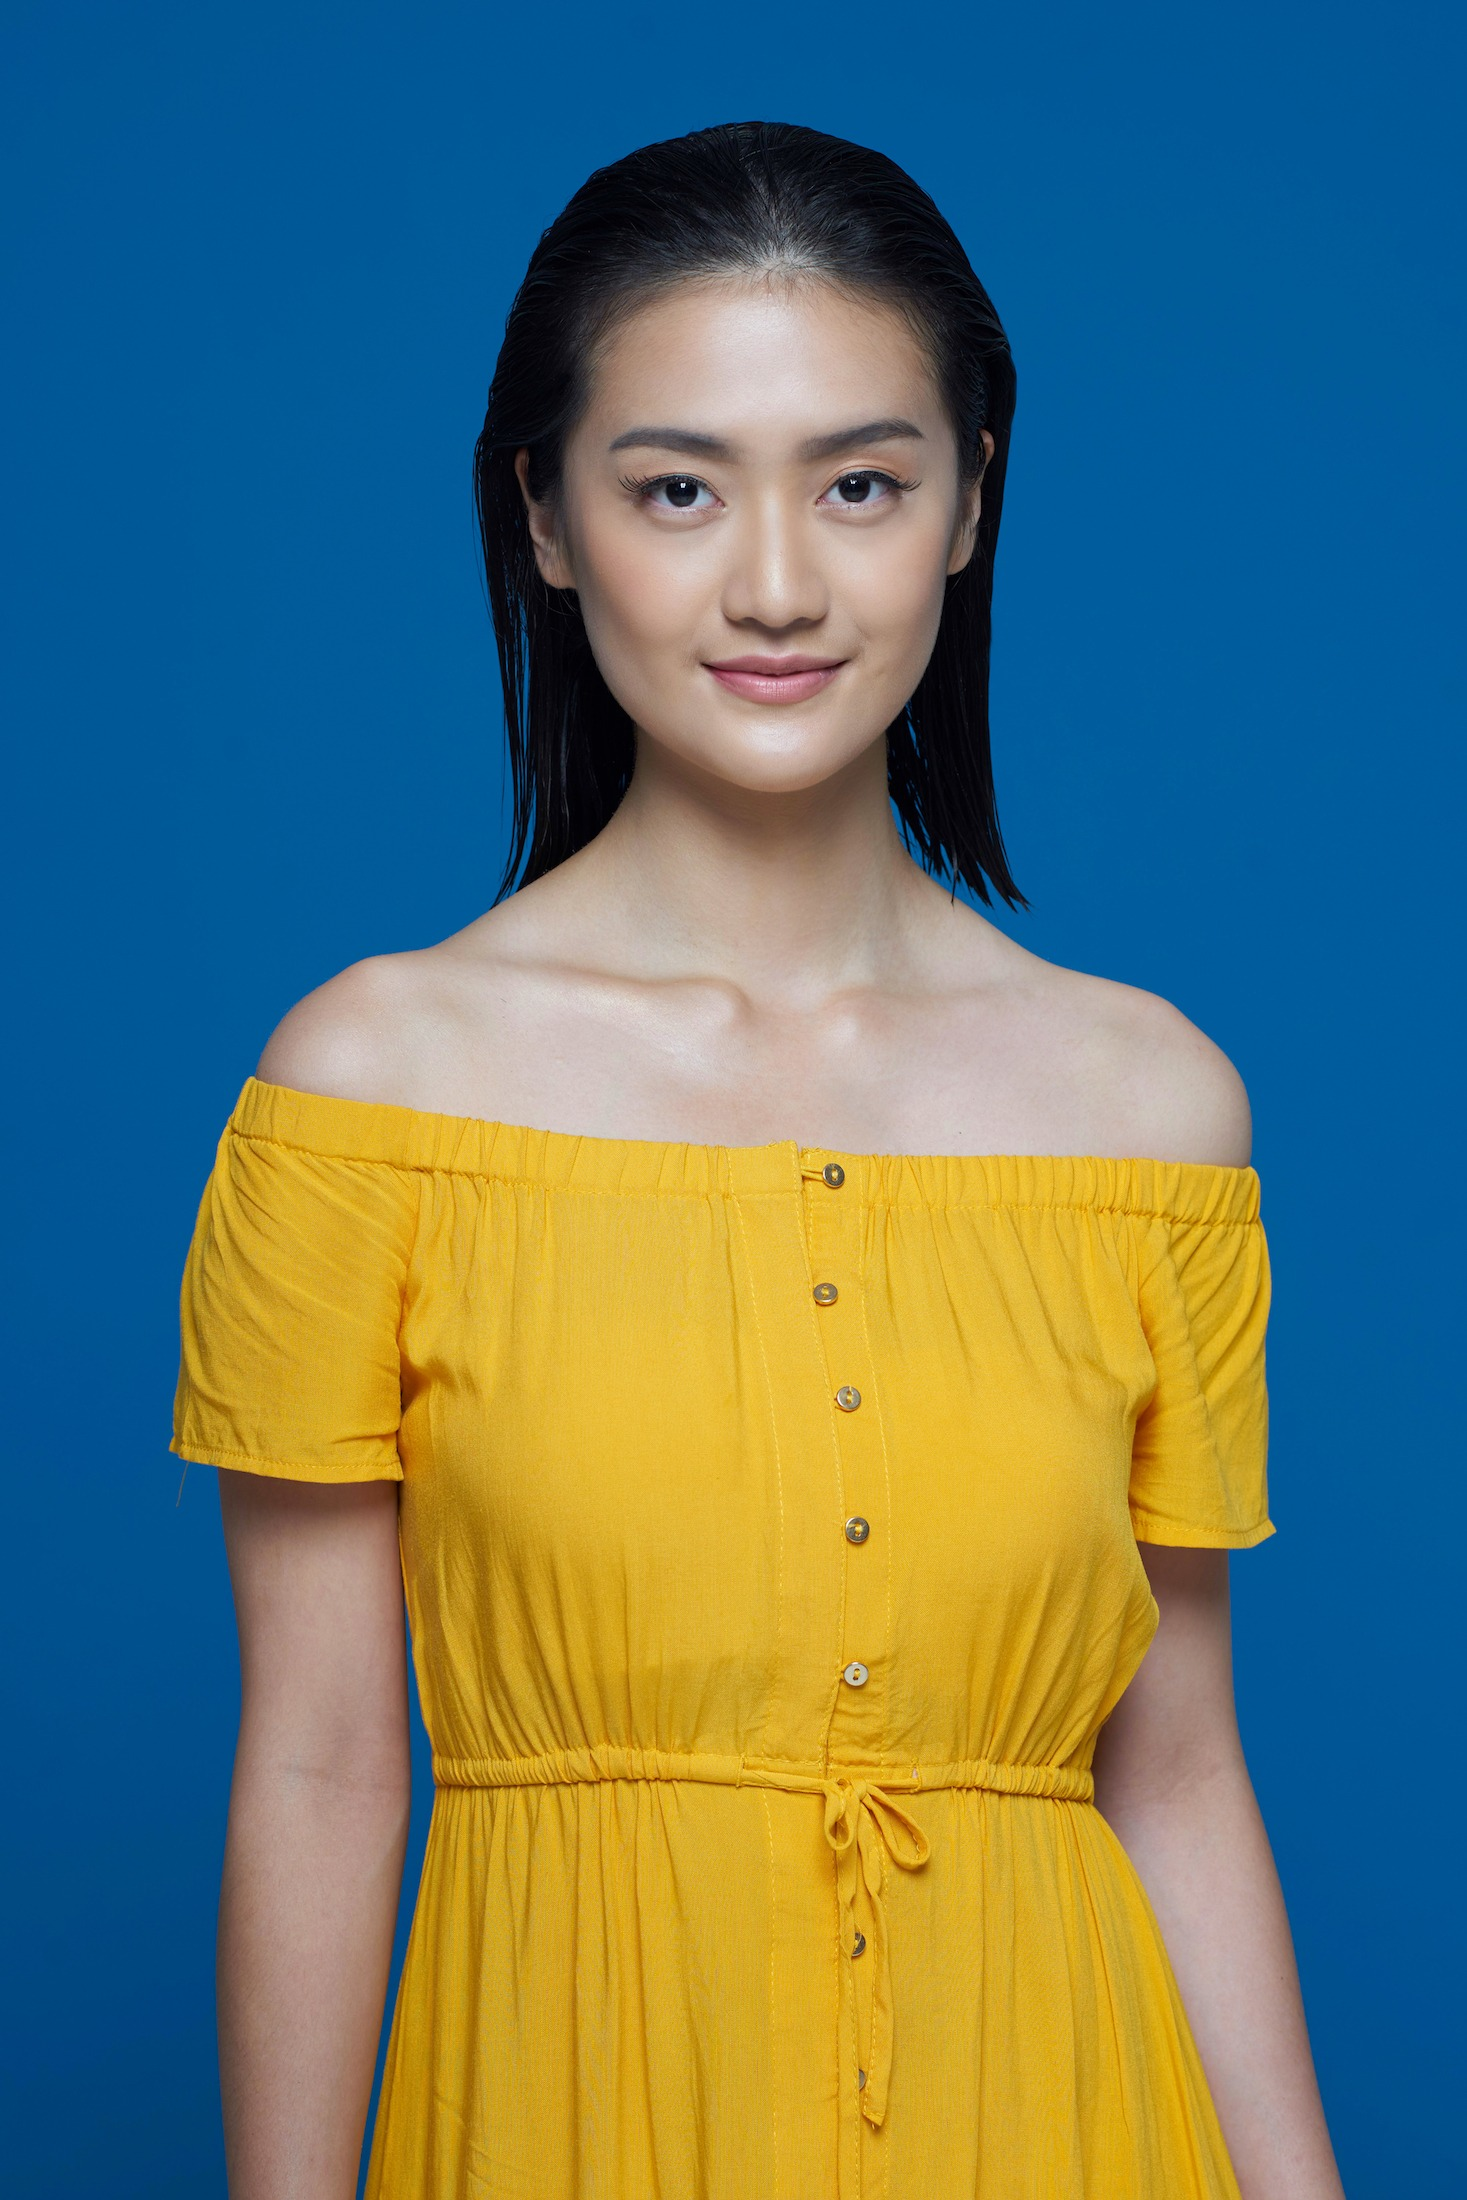 Wanita Asia dengan rambut bob sebahu wet look